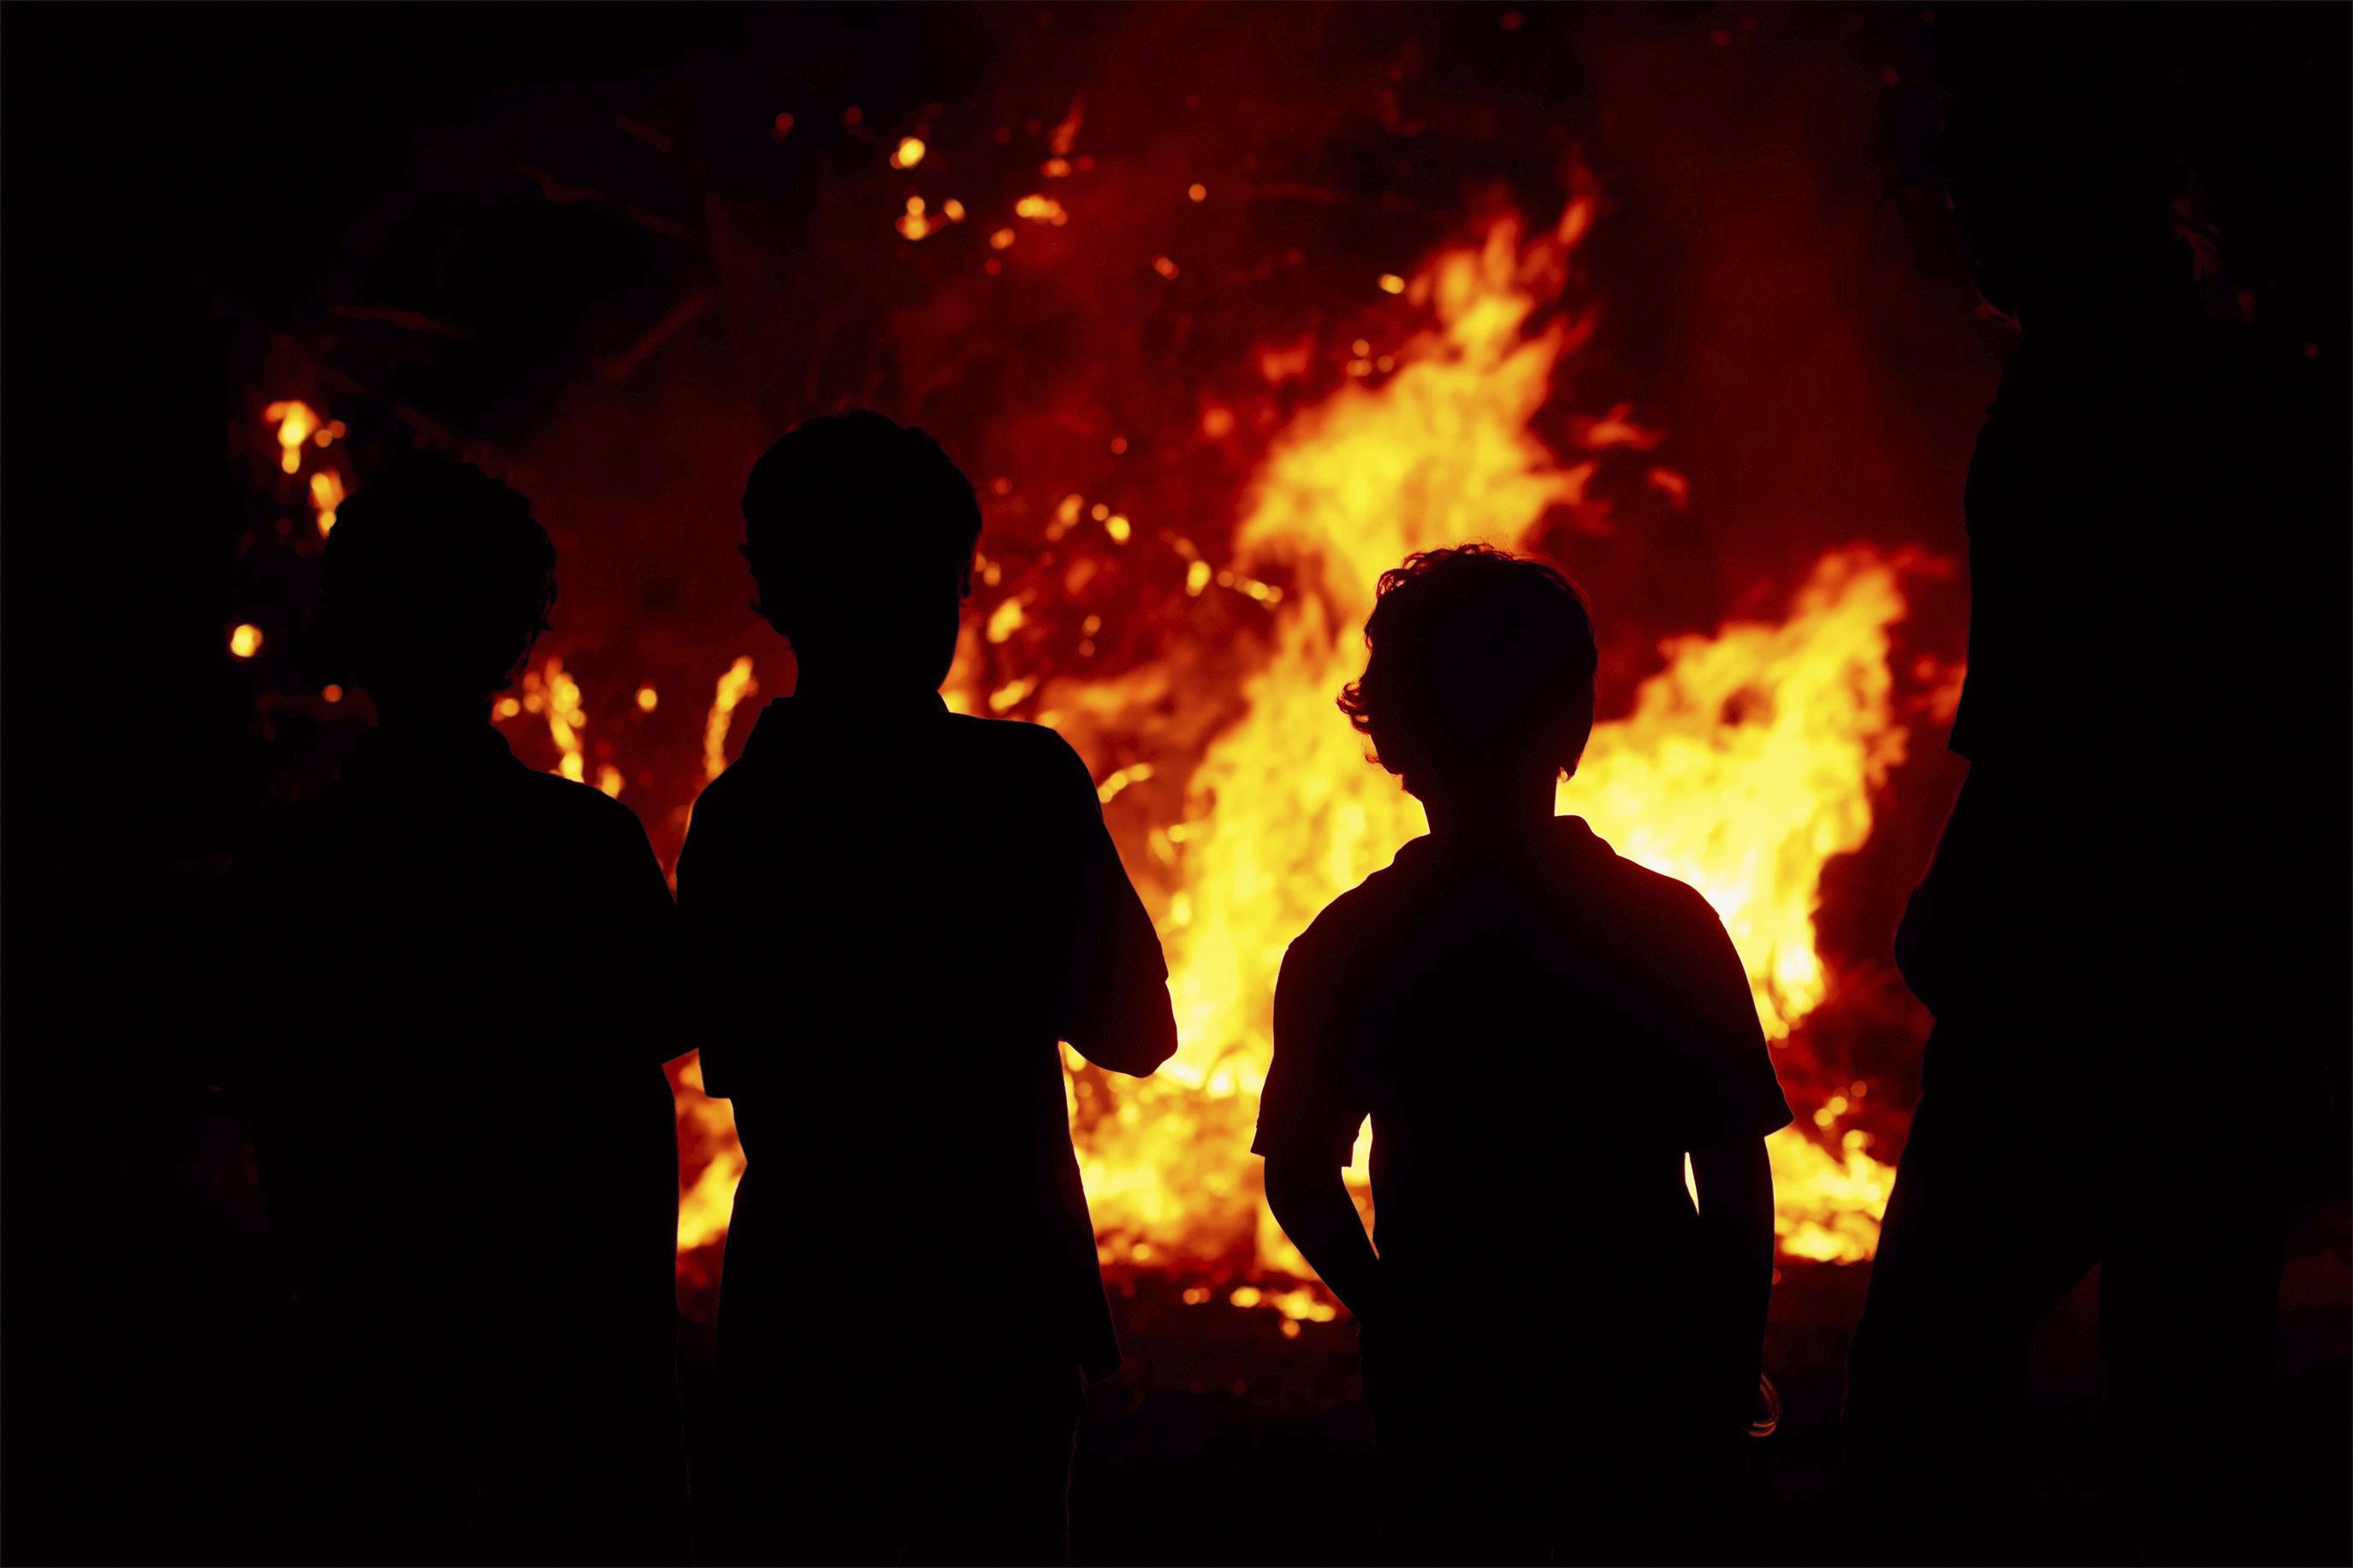 Standing around the bonfire at night.